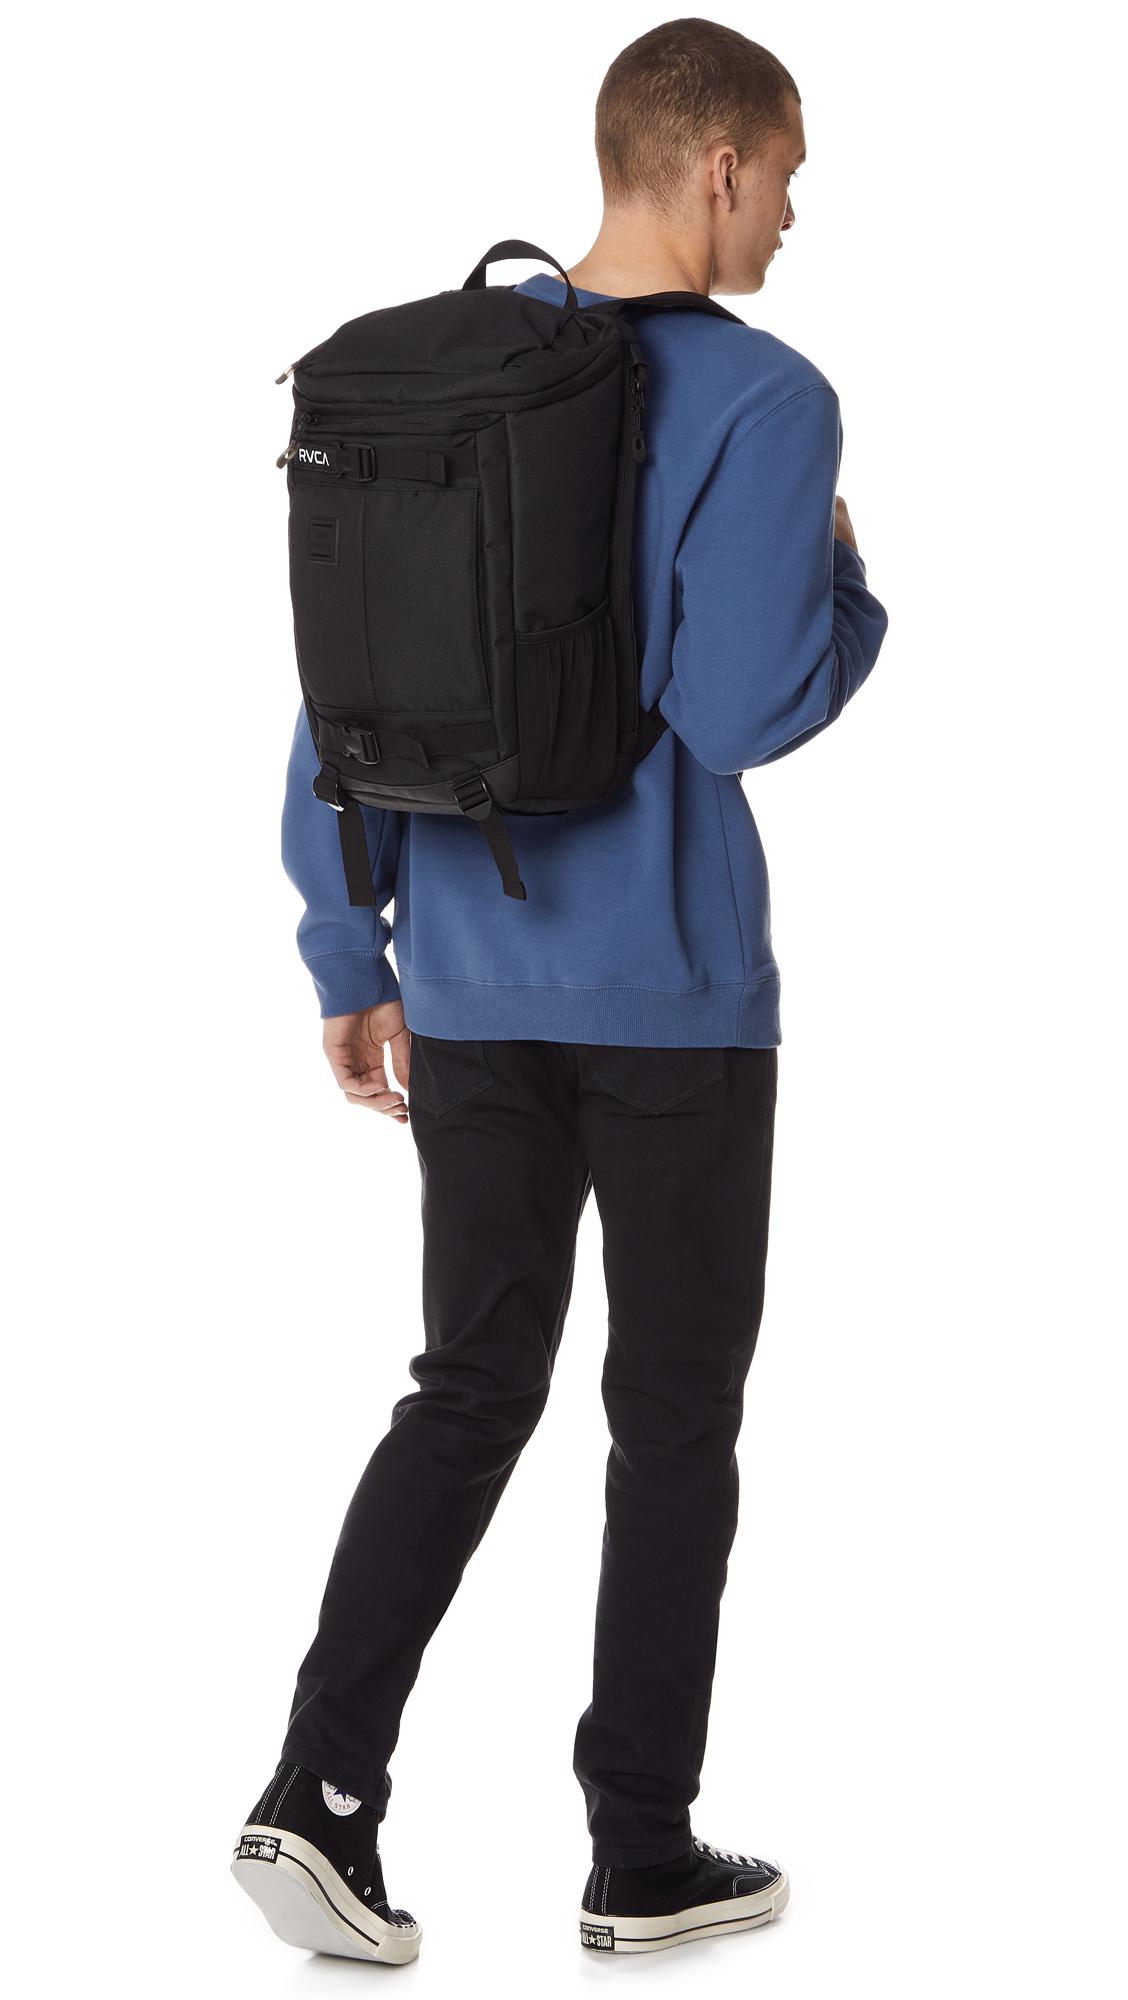 RVCA Voyage Skate Commuter Backpack  83899f90deacd